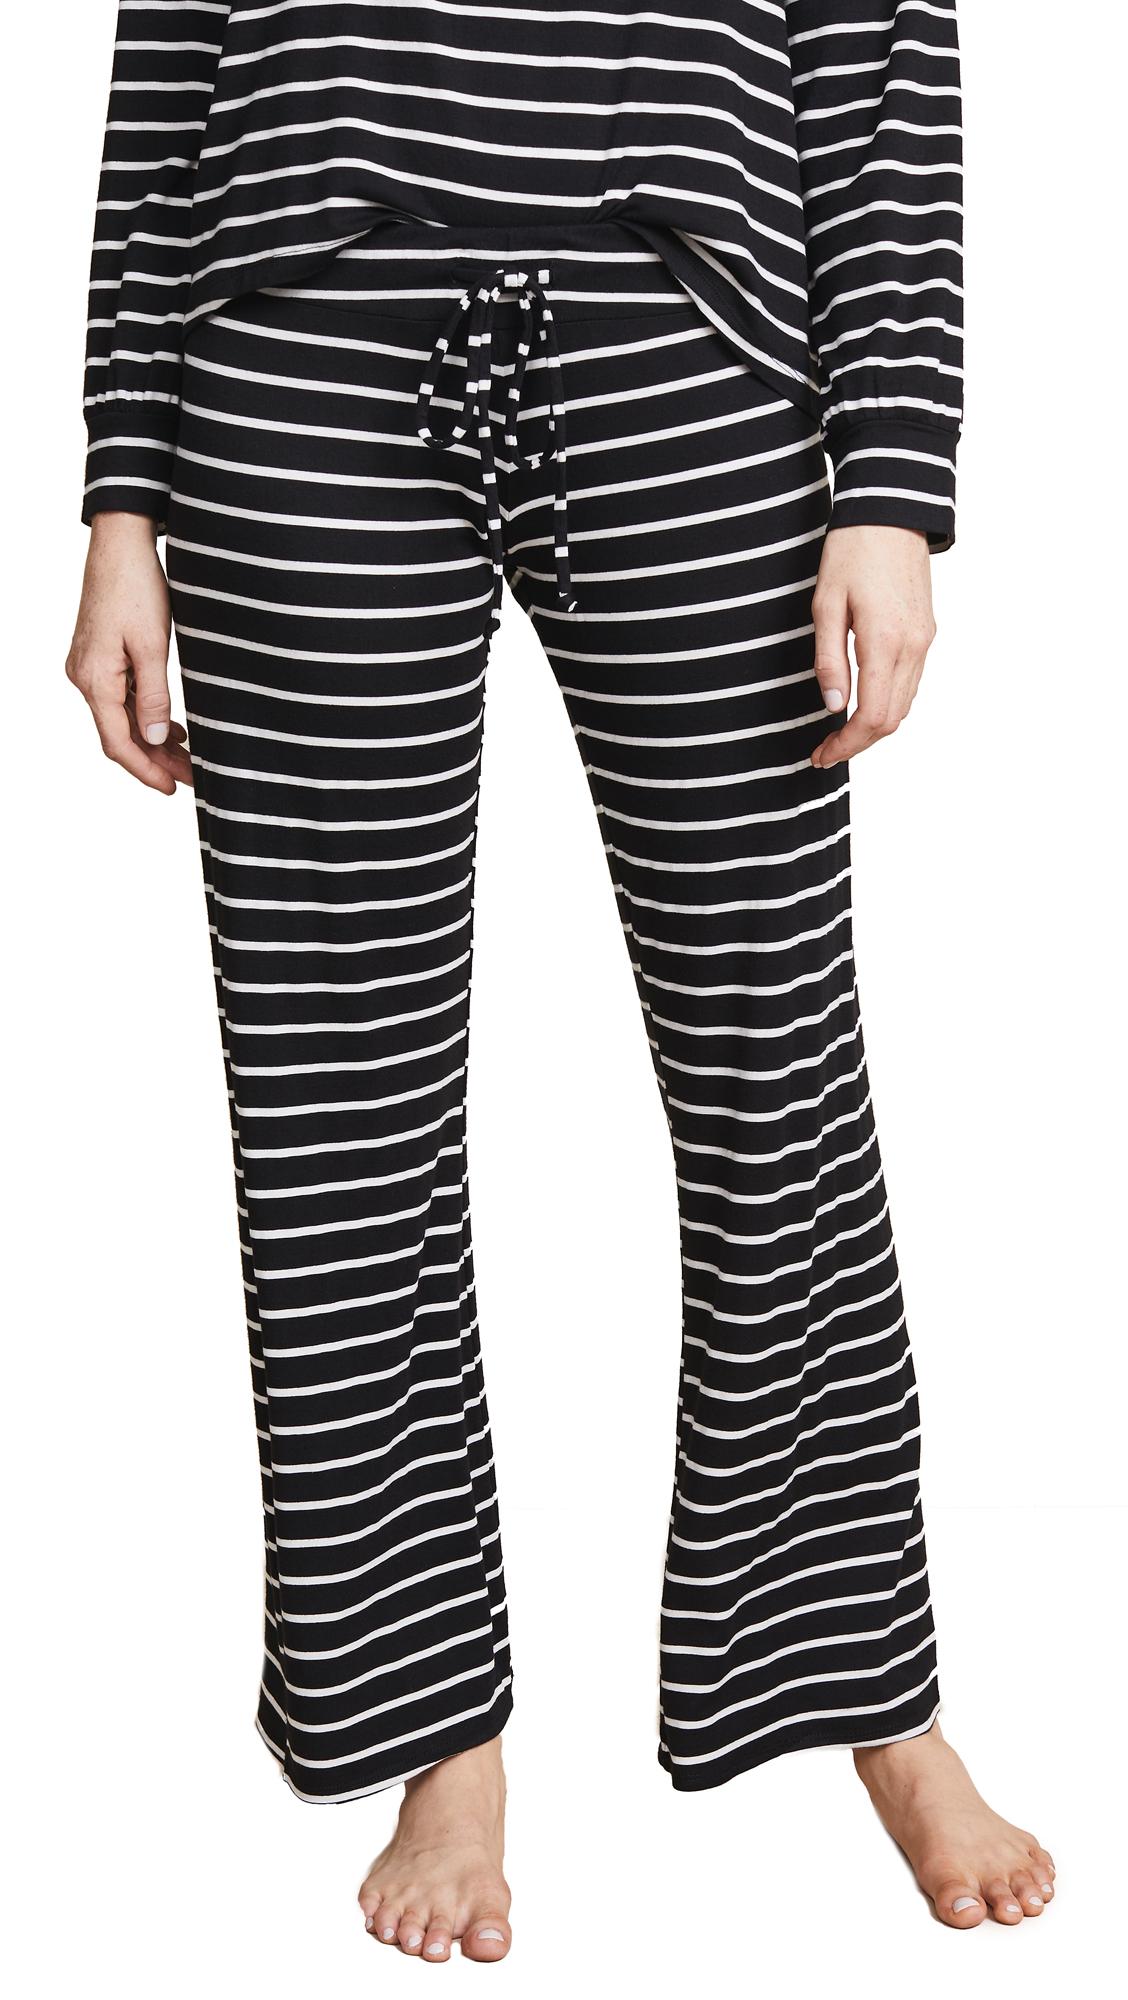 Eberjey Lounge Stripes PJ Pants In Black/Ivory